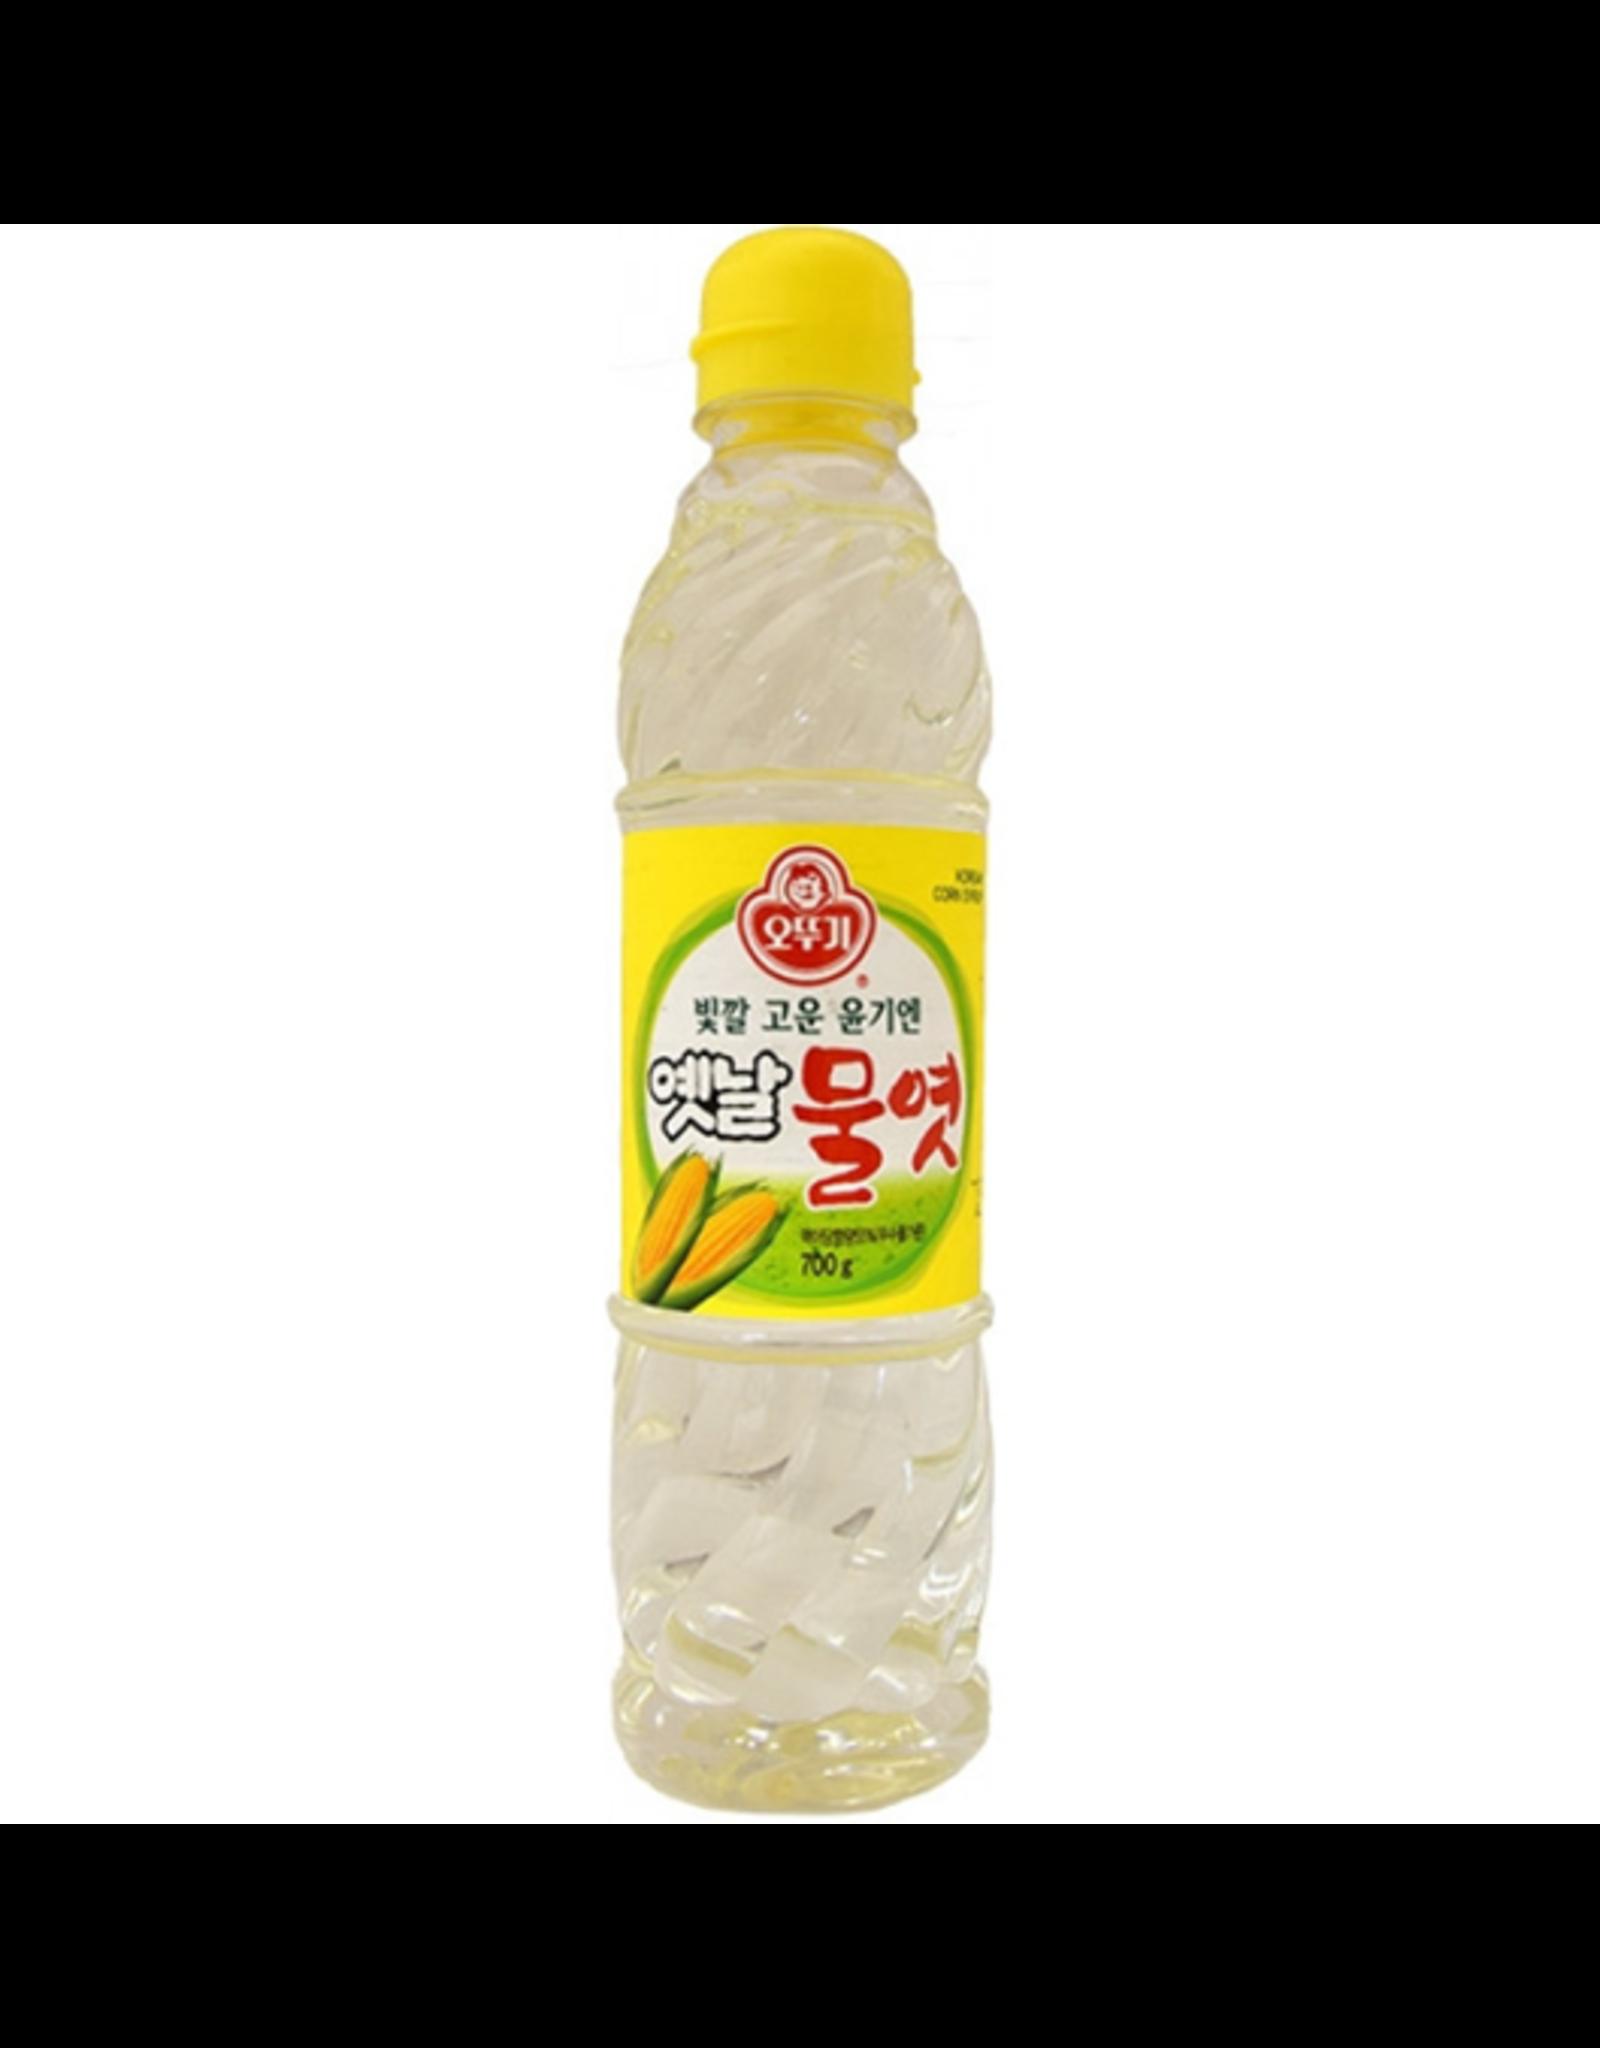 Ottogi Korean Corn Syrup